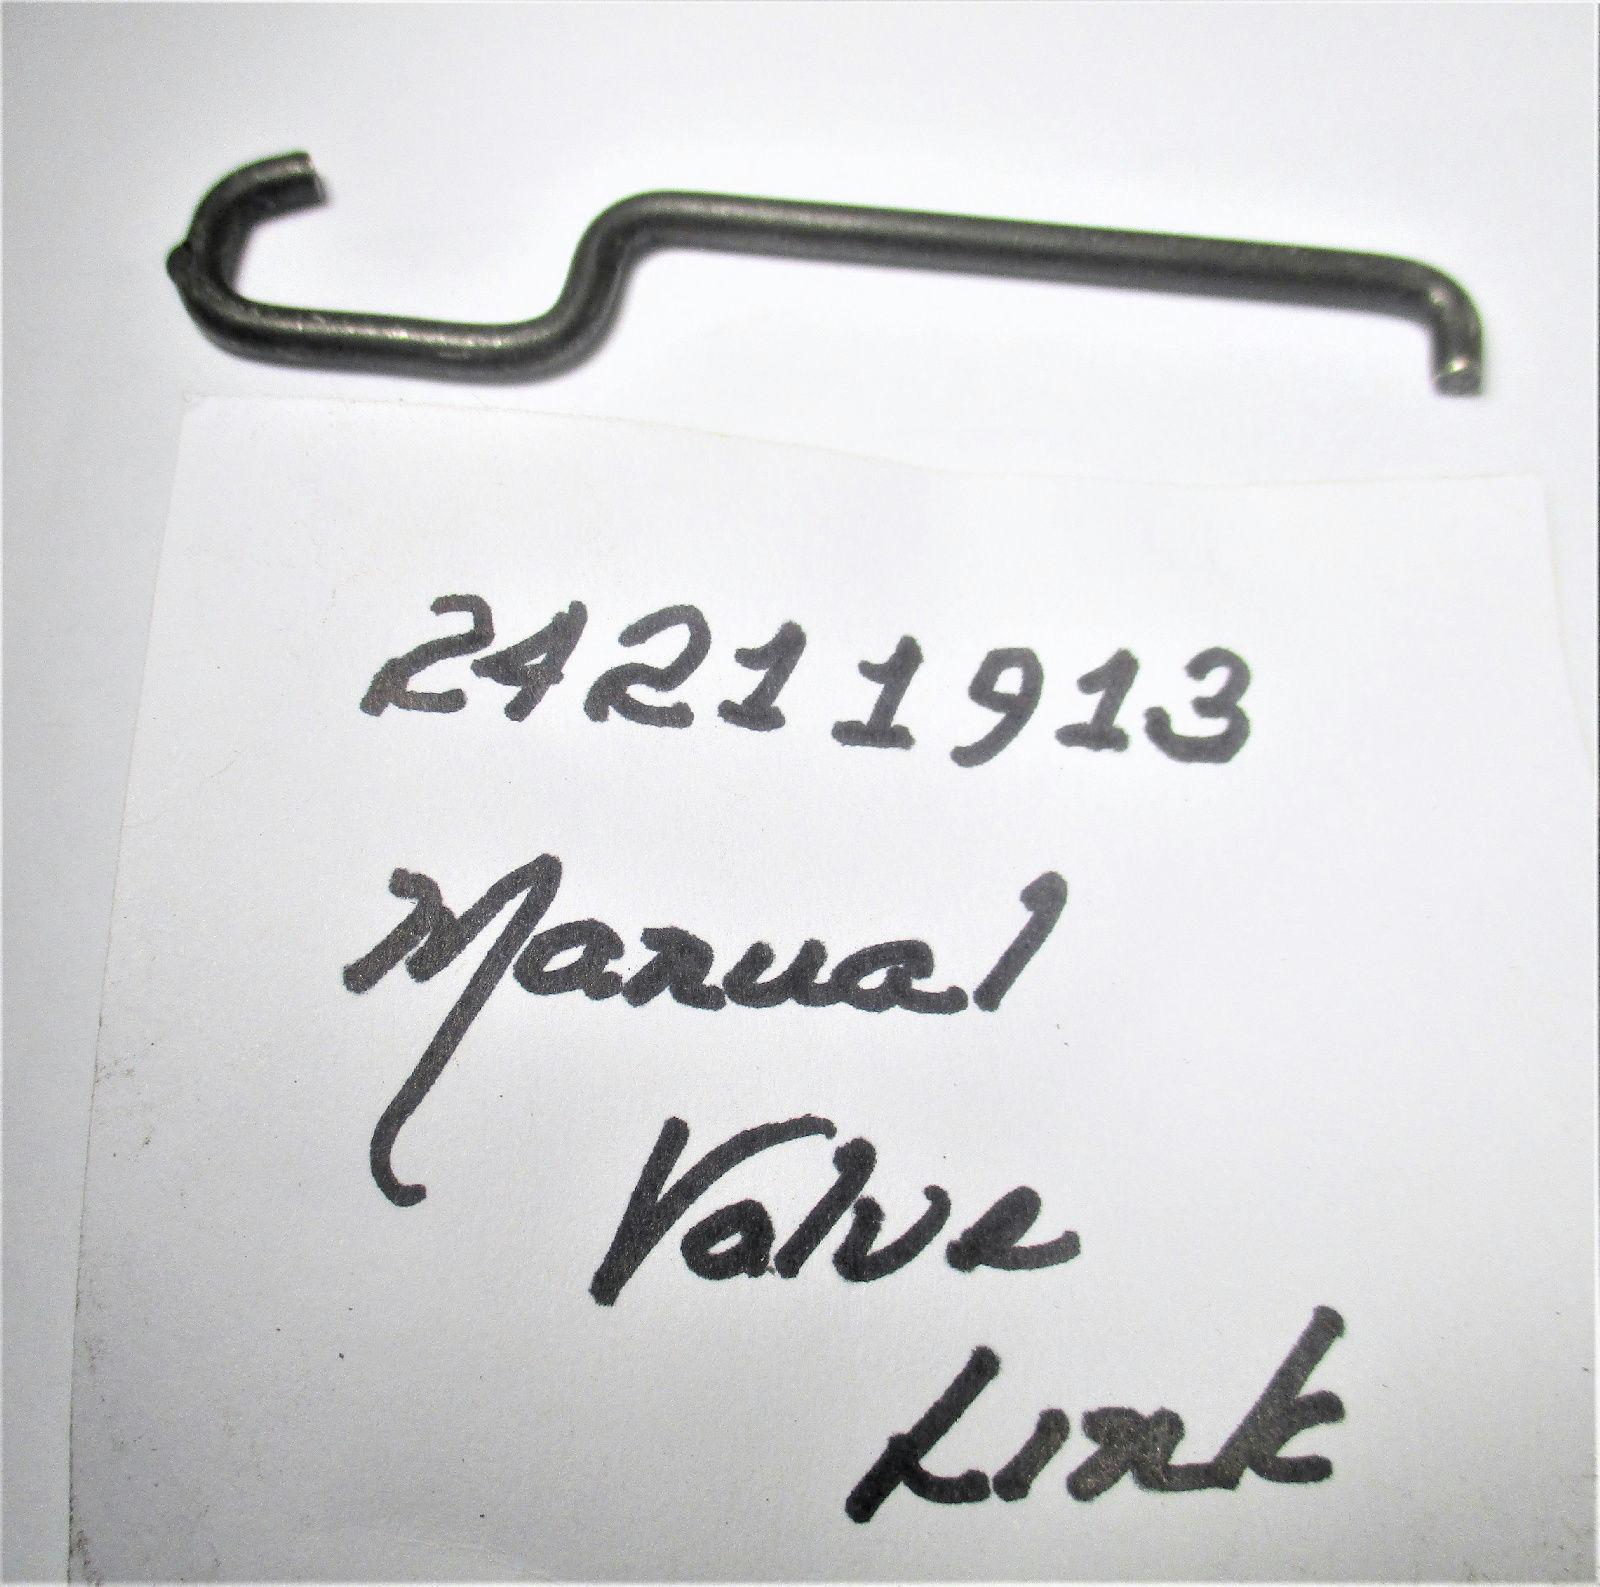 GM ACDelco Original 24211913 Manual Valve Link General Motors Transmission New